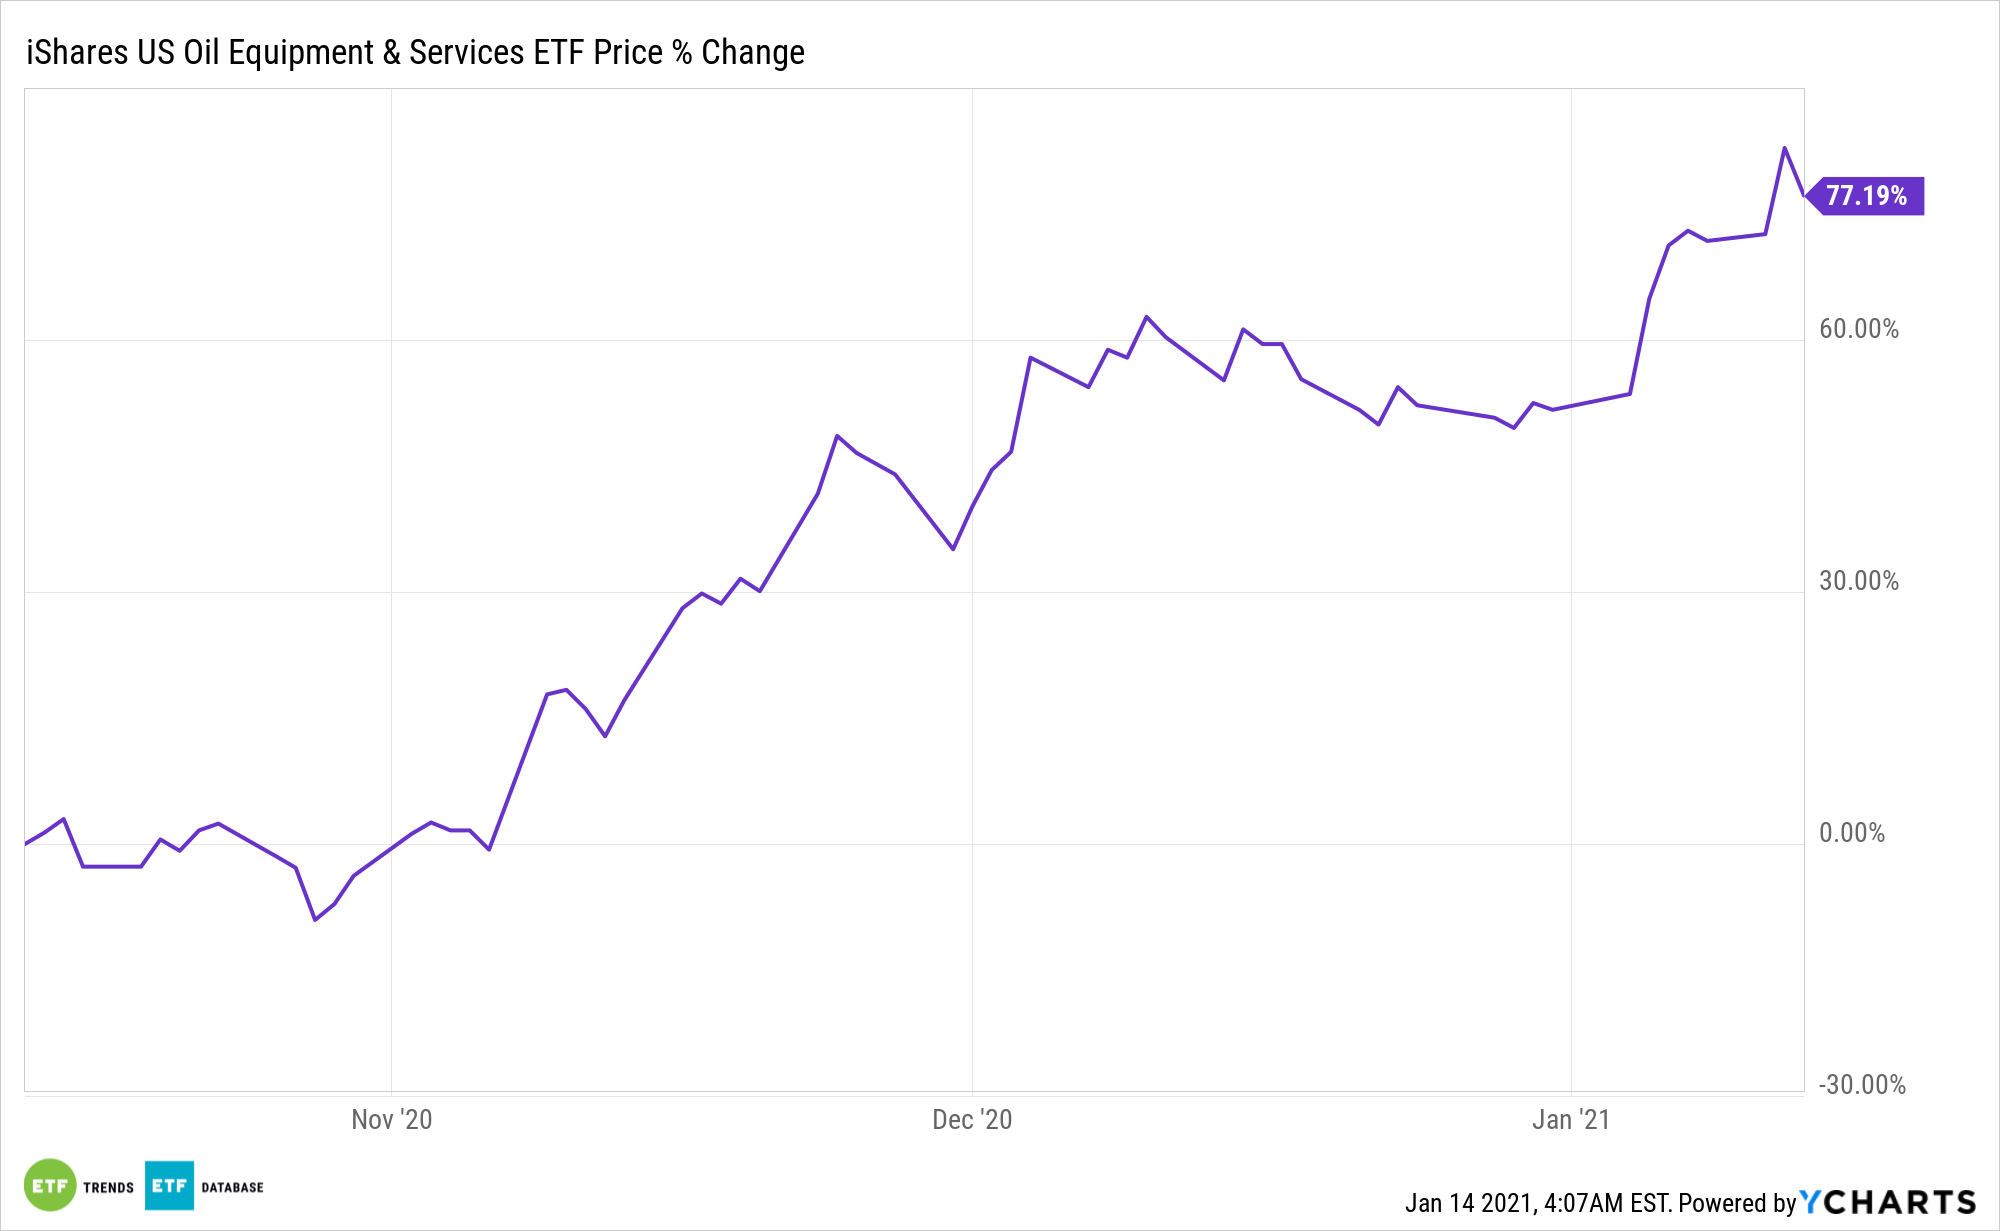 IEZ Chart